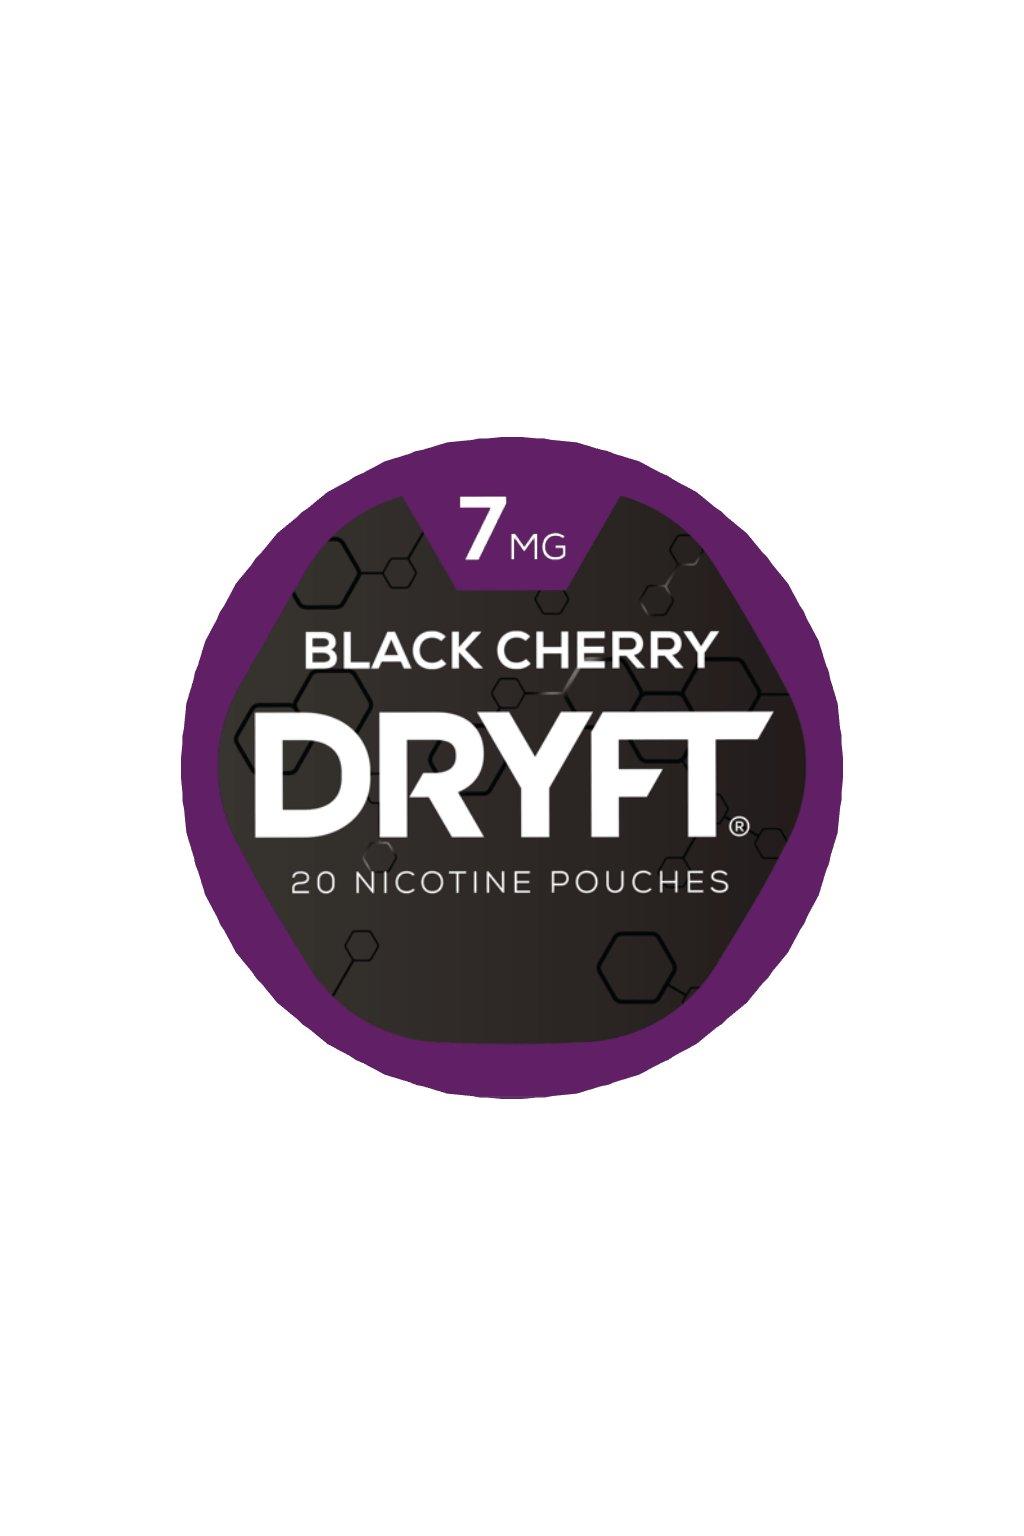 Dryft black cherry min